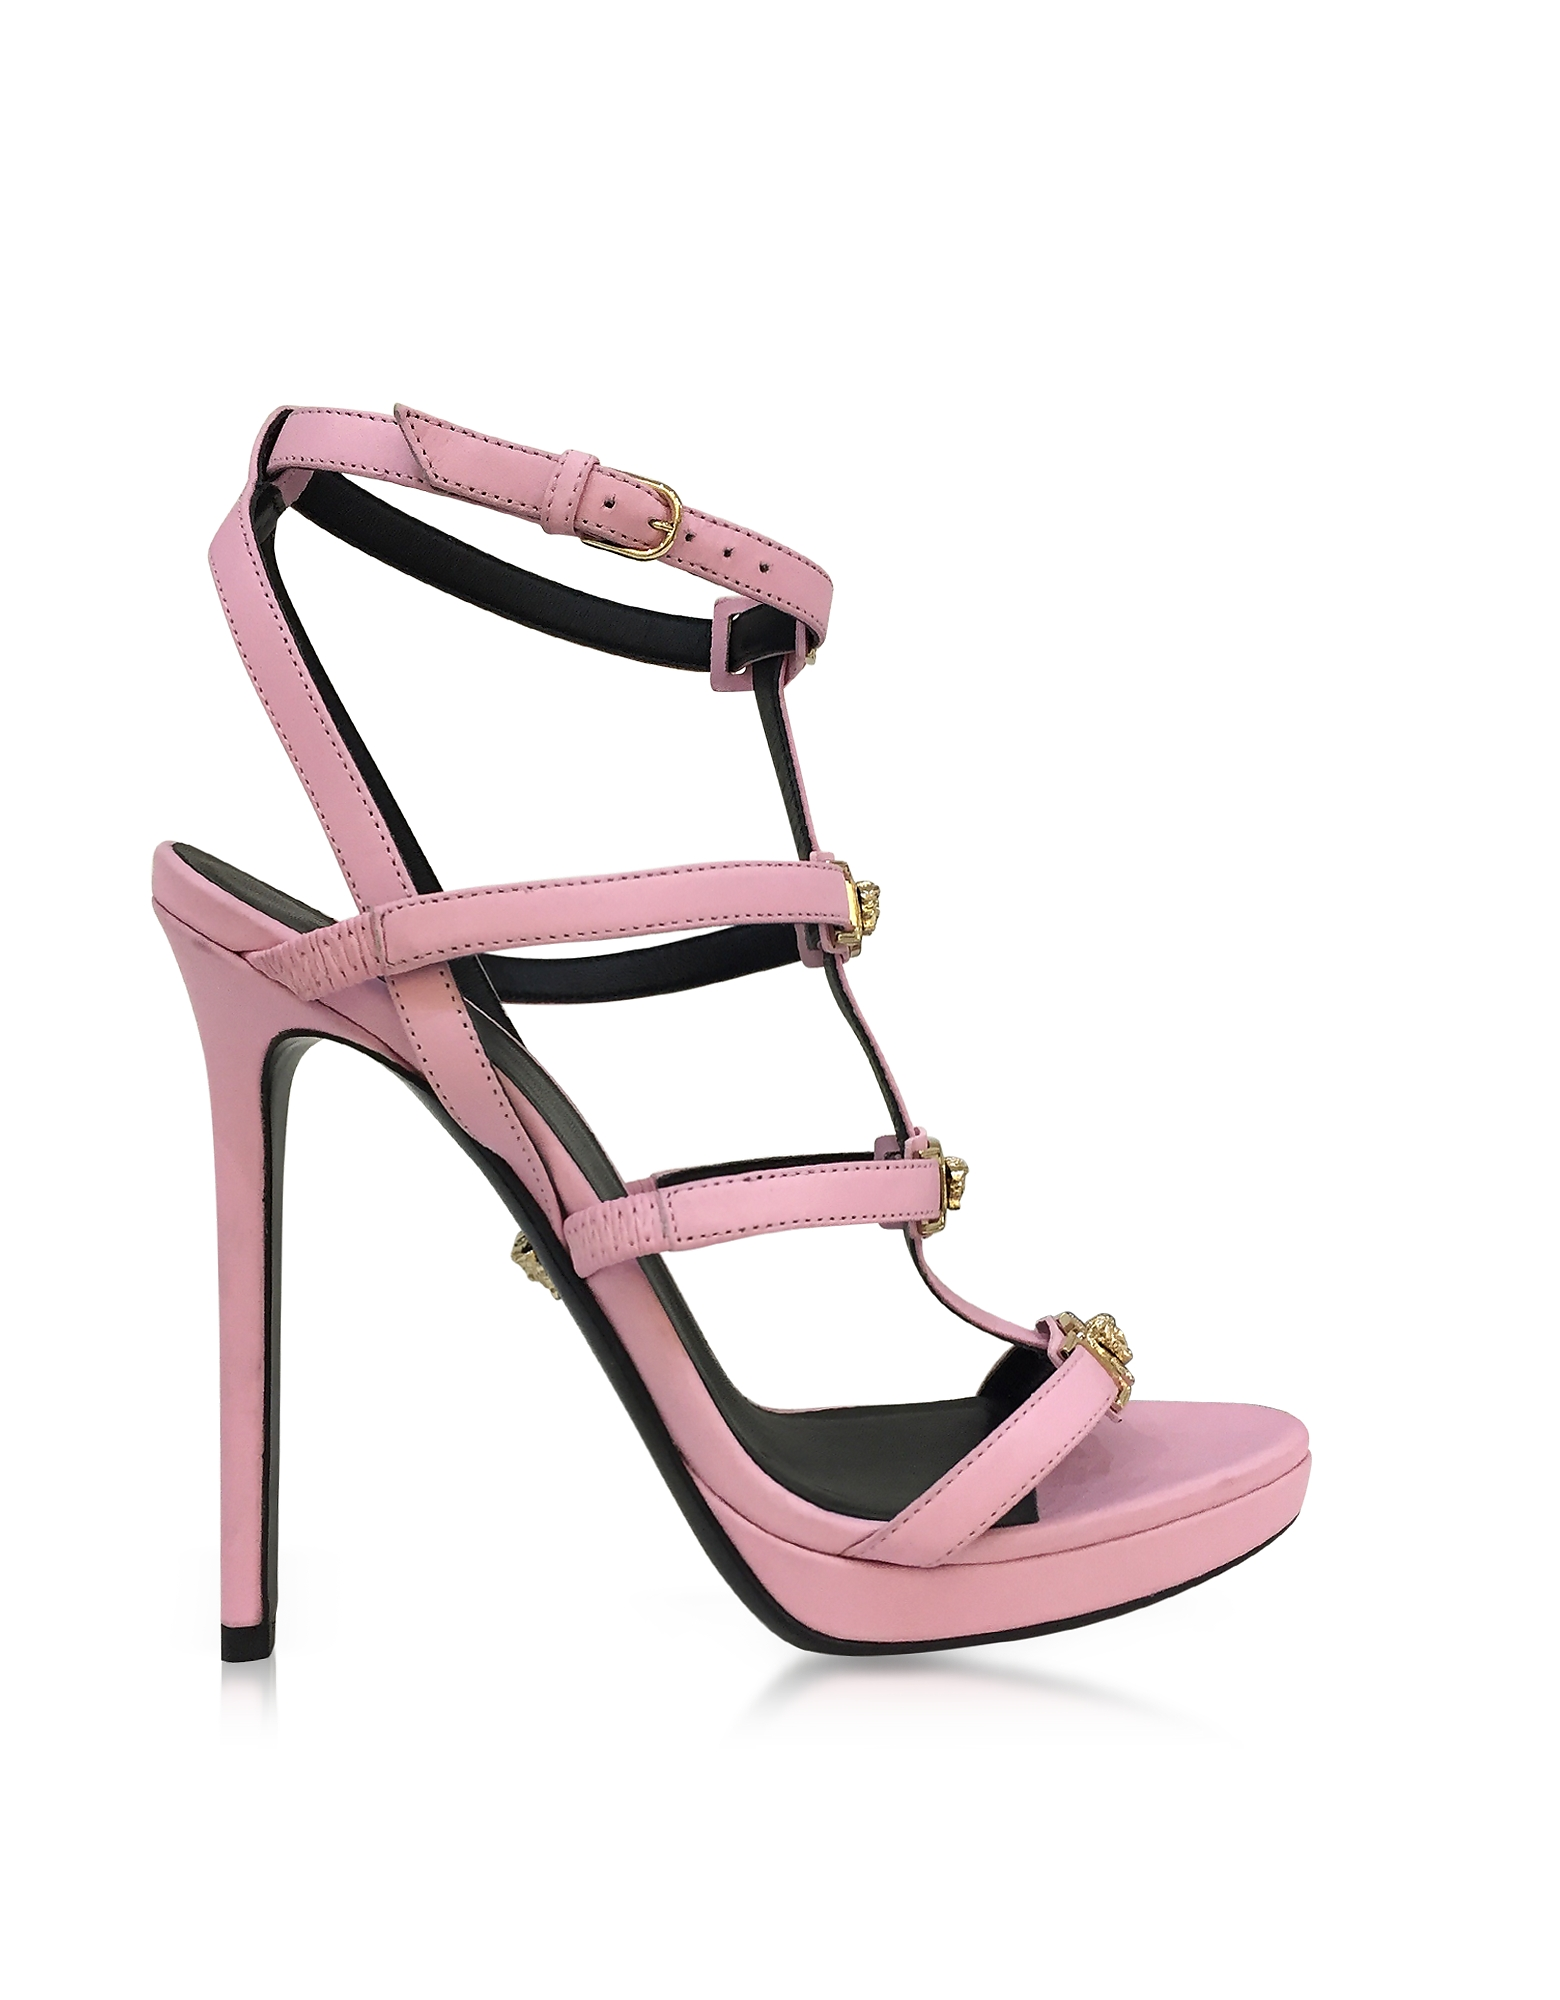 Versace Shoes, Pink Leather Sandal w/Light Gold Medusa